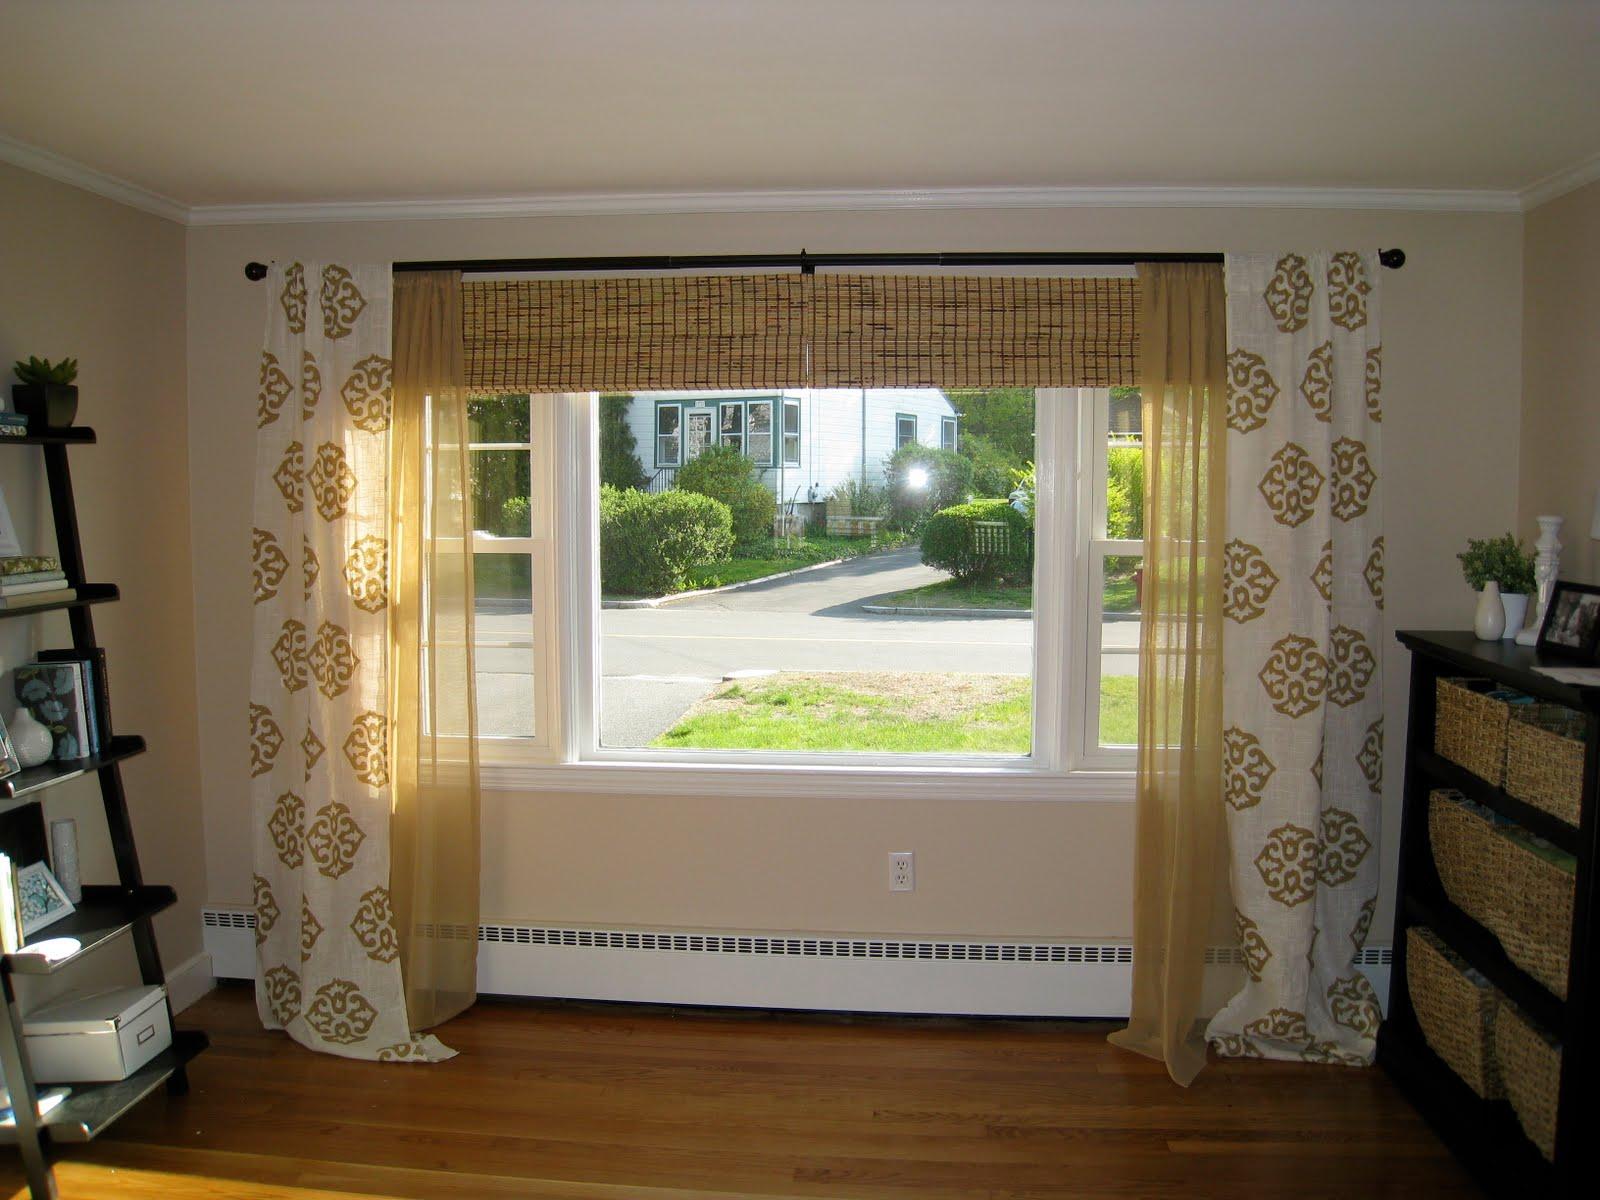 reno 366 curtains round 3. Black Bedroom Furniture Sets. Home Design Ideas